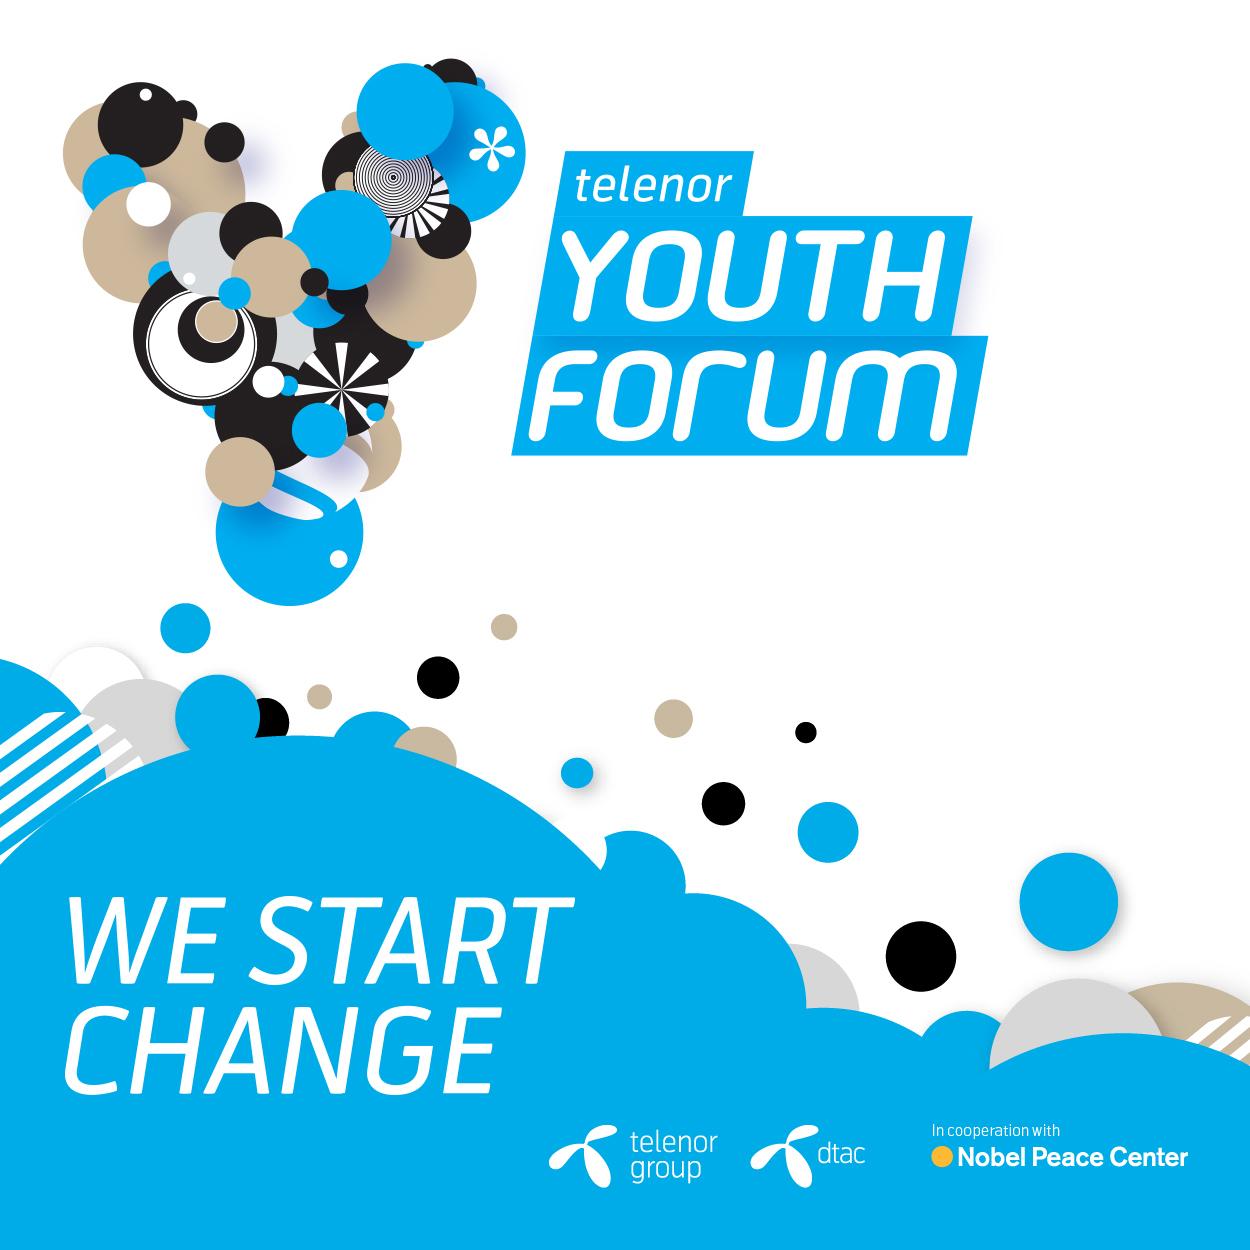 Otvoren konkurs za Telenor forum mladih 2017